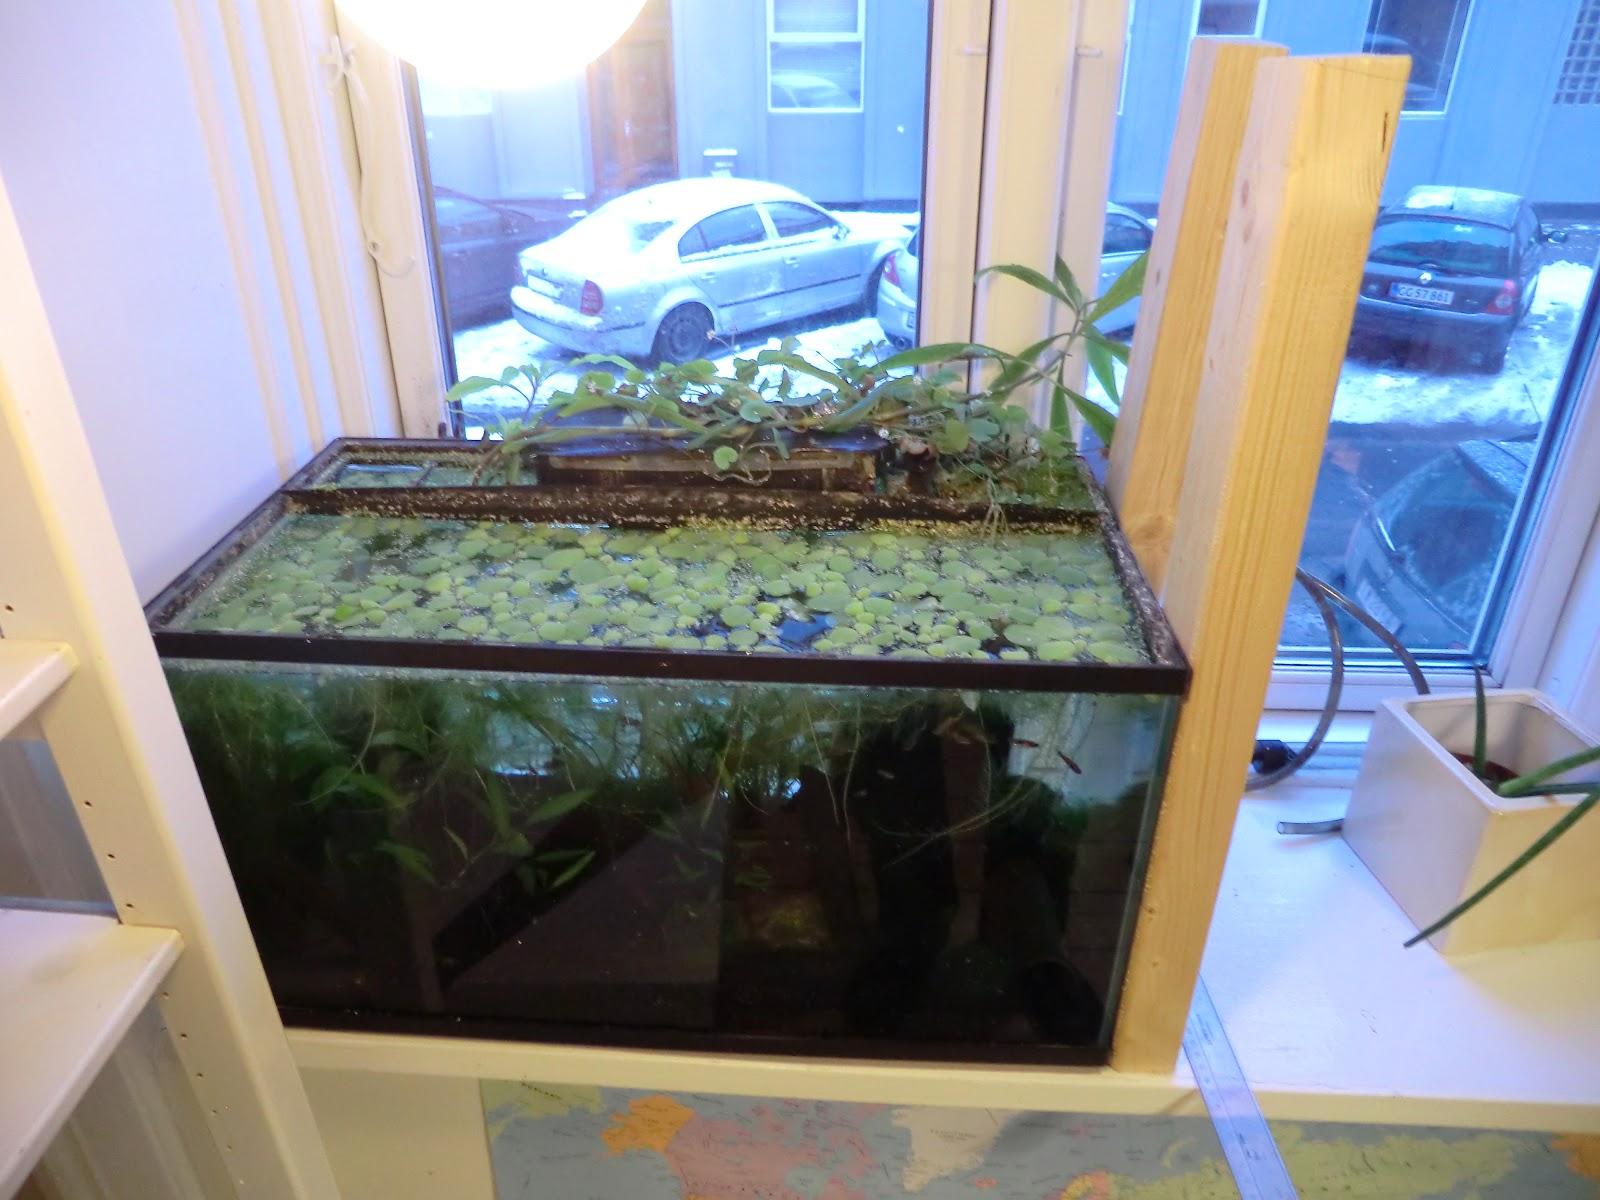 The Fishtank Aquaponics 2 Apartment Aquaponics